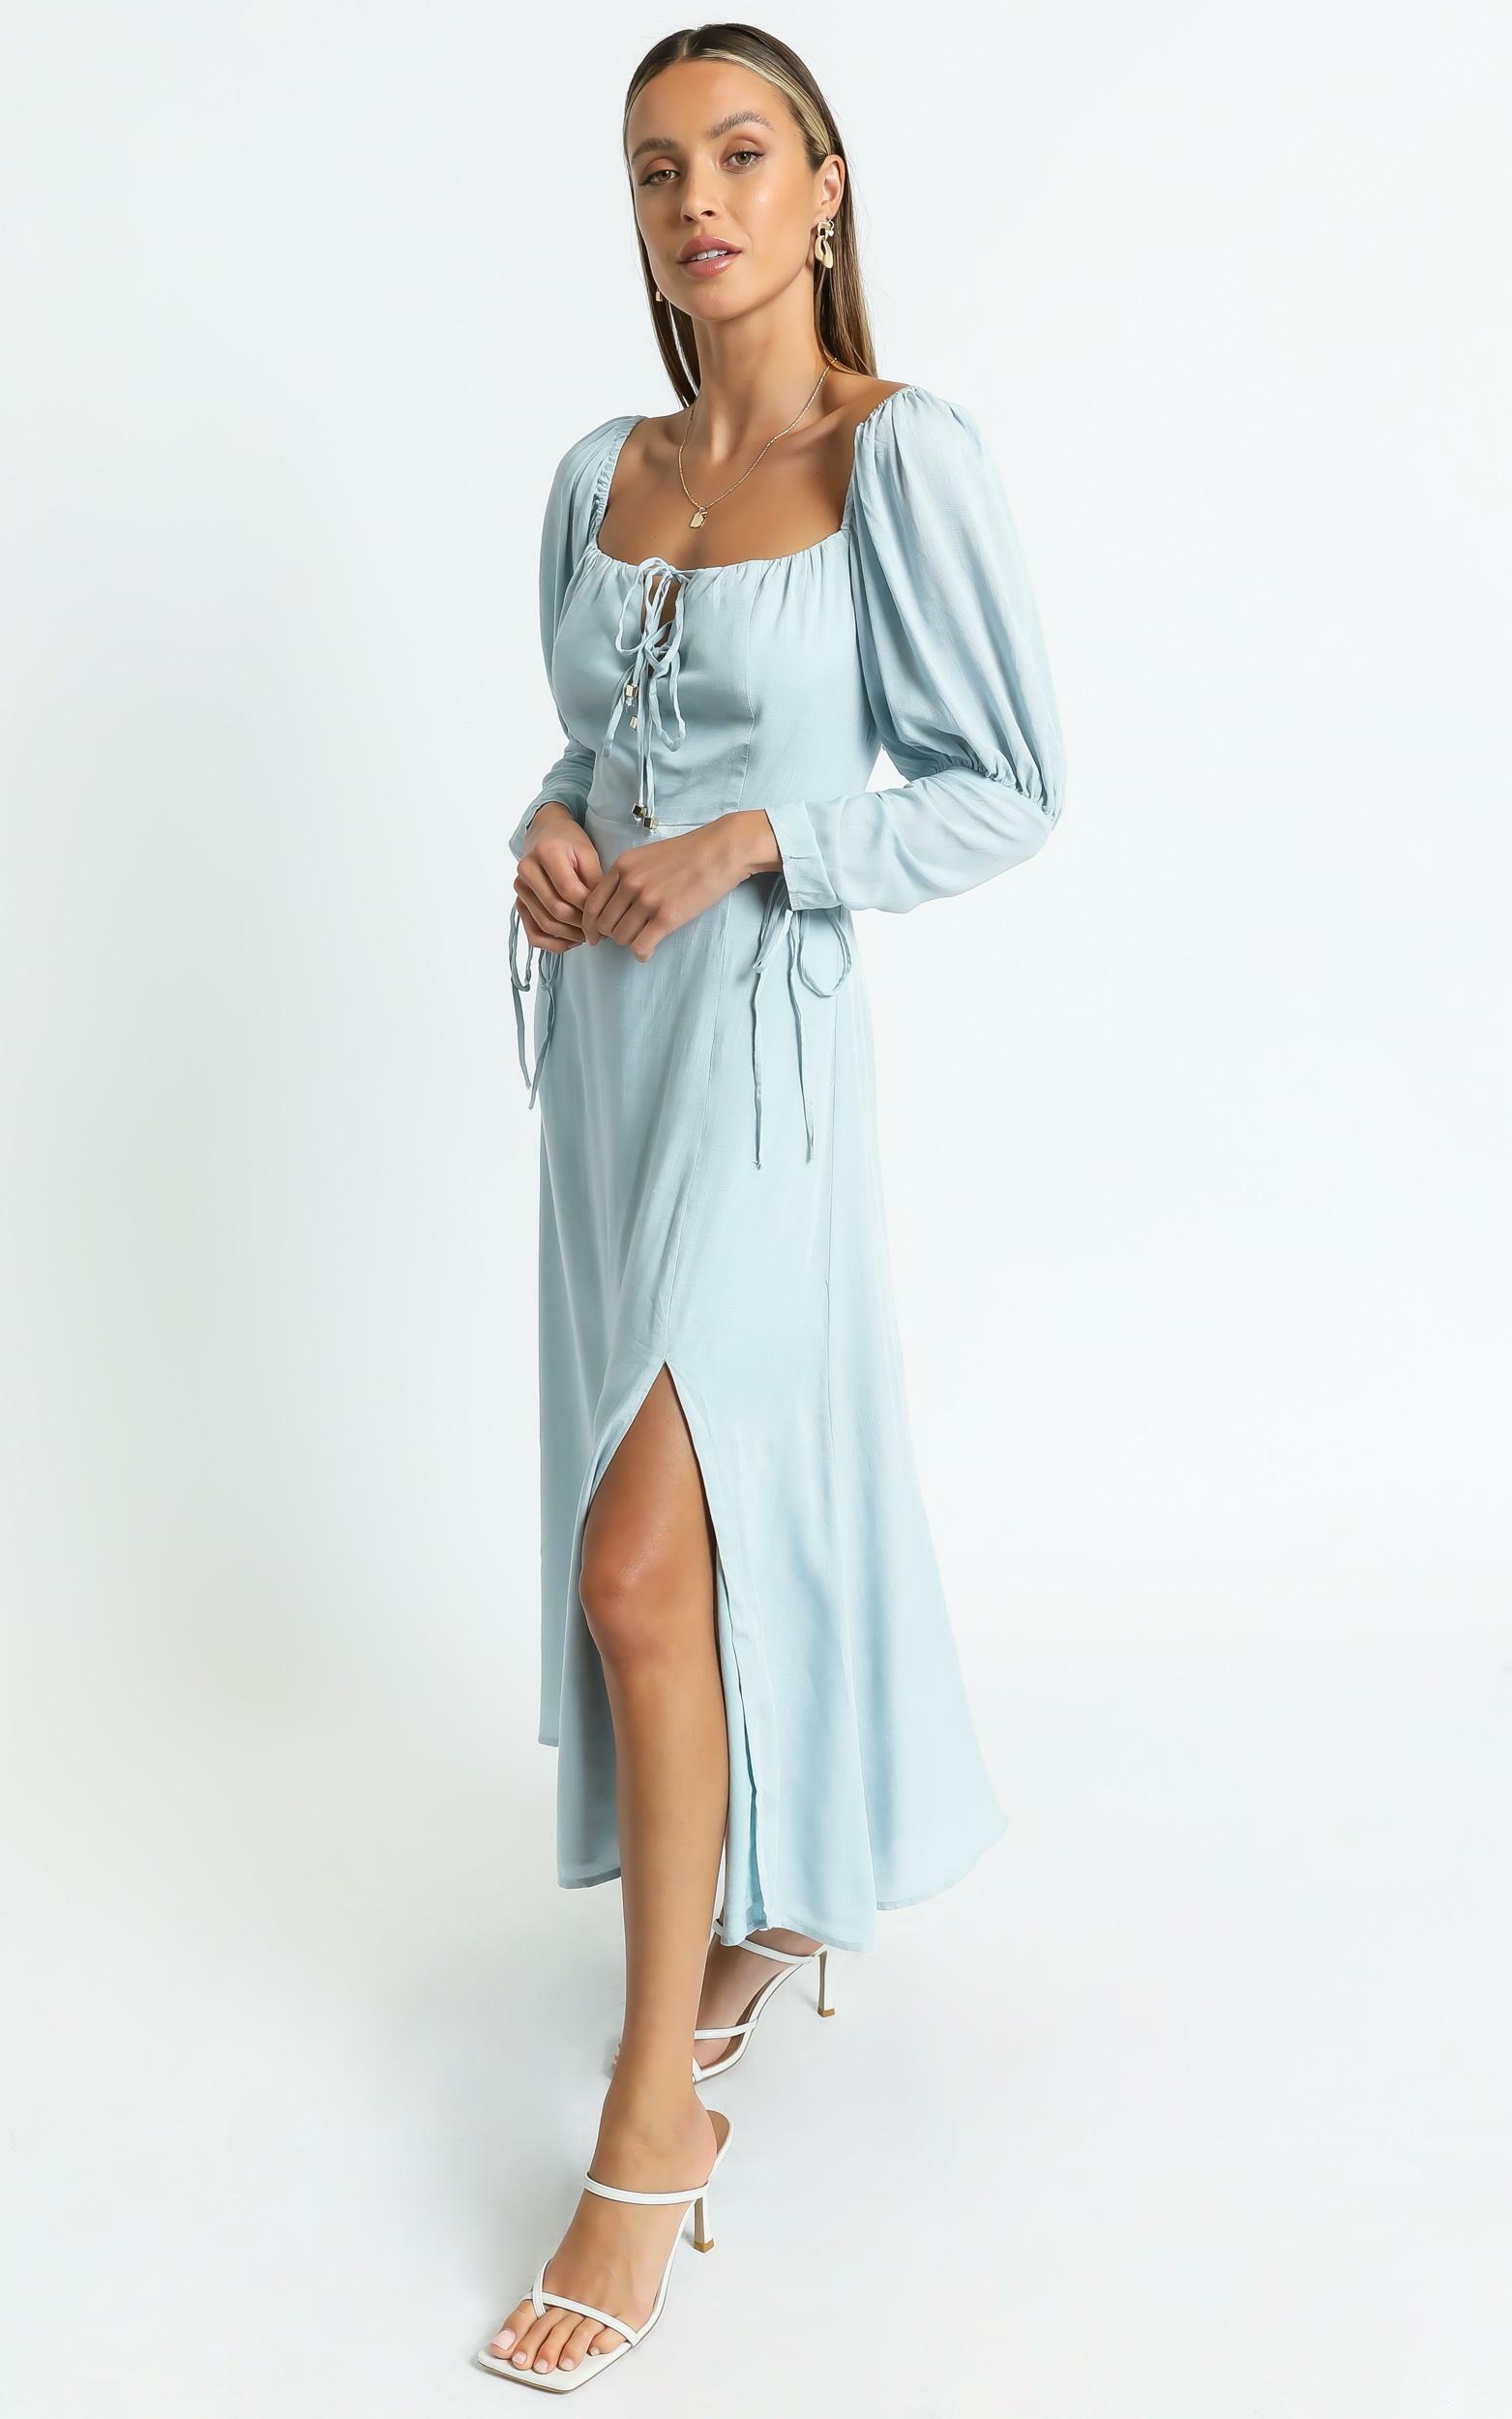 Ansel Dress in Blue Linen Look - 06, BLU1, hi-res image number null